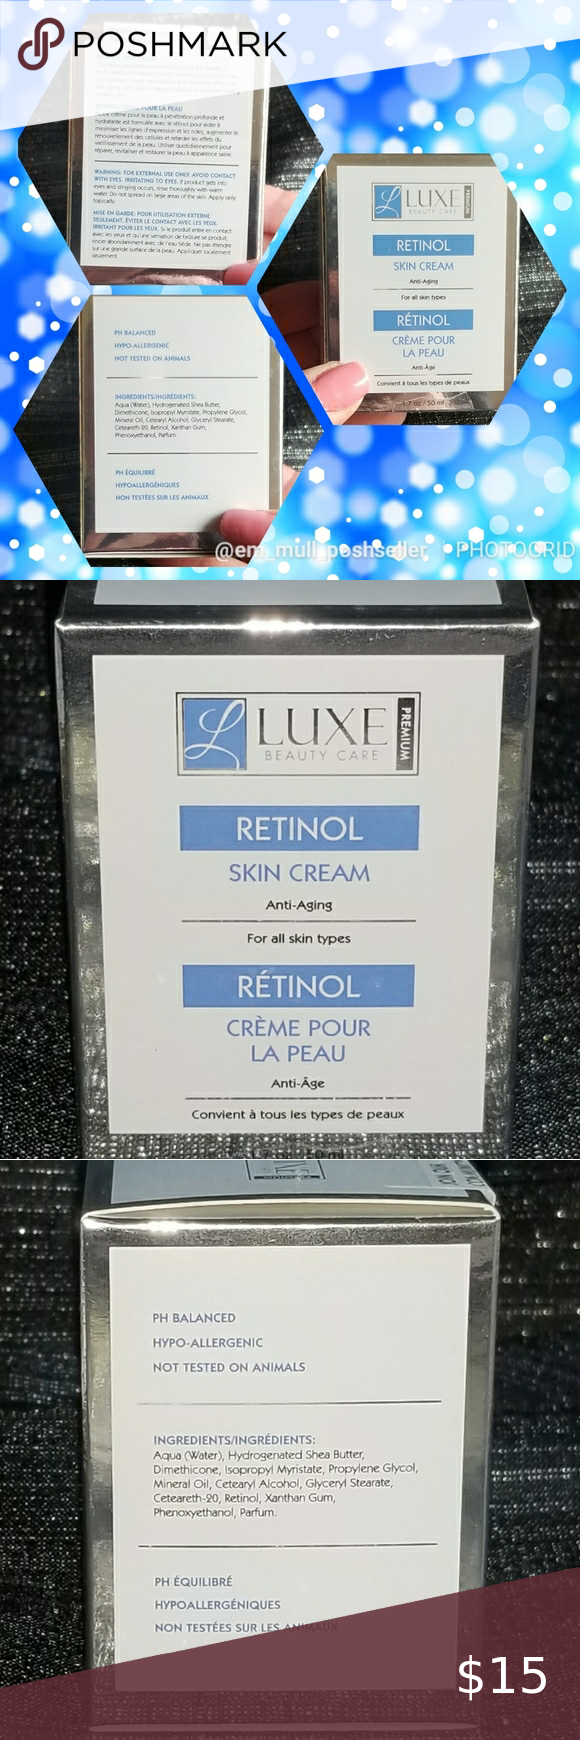 Luxe Global Beauty Care Retinol Skin Cream In 2020 Skin Cream Beauty Care Skin Cream Anti Aging